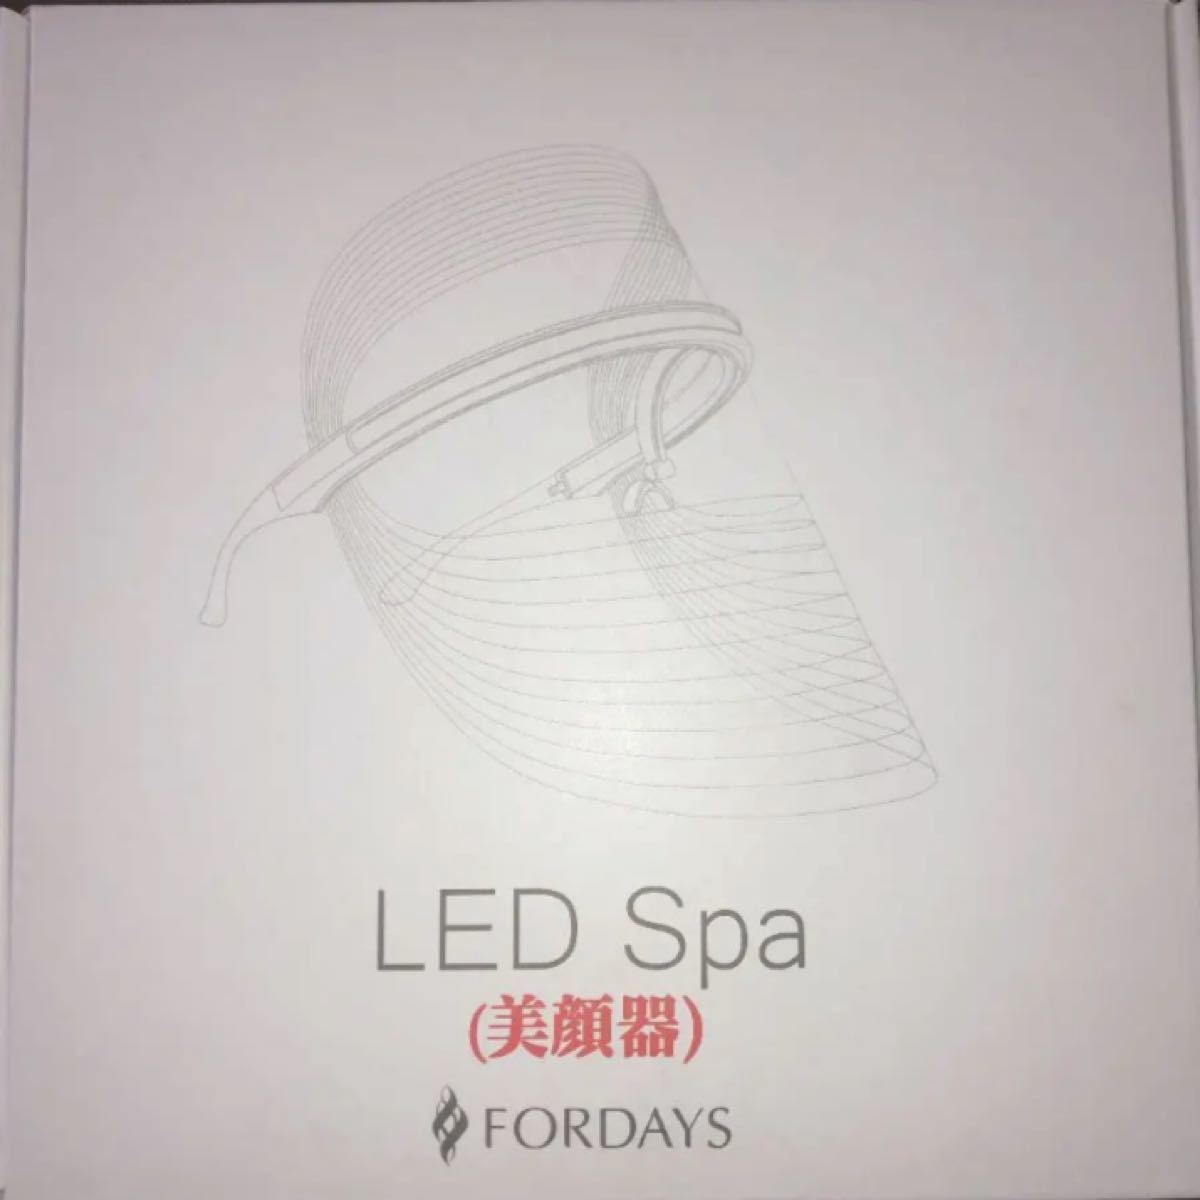 LED spa (フォーデイズFORDAYS新品未使用)